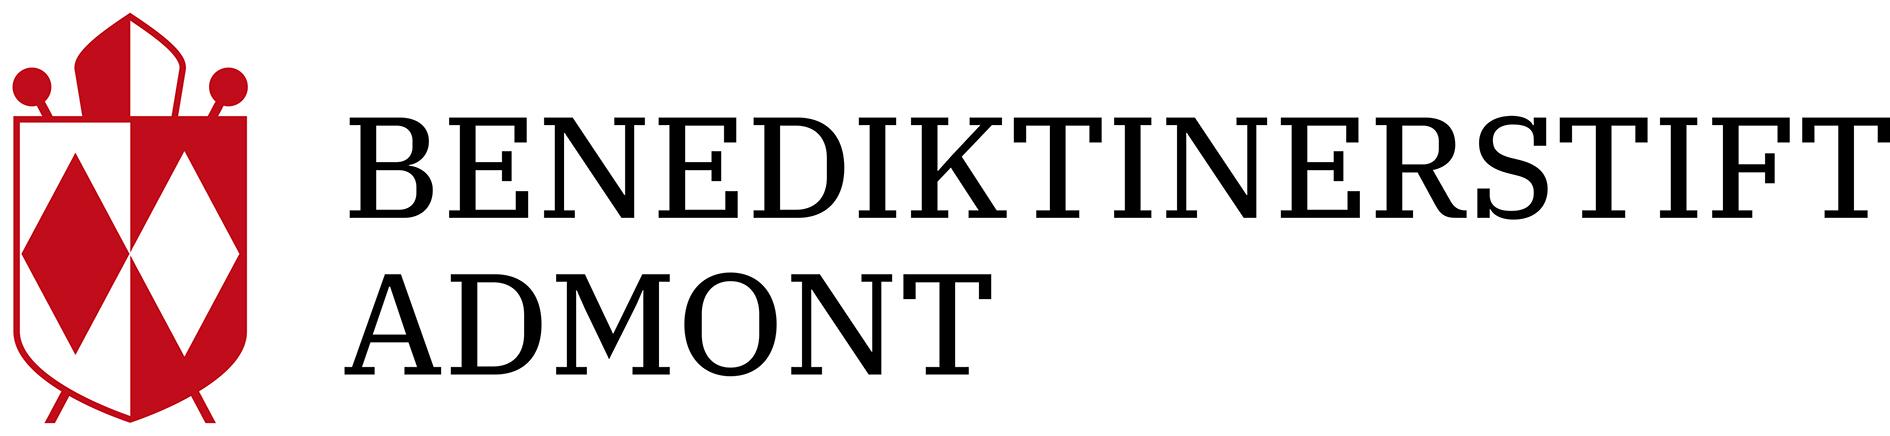 Benediktinerstift Admont RGB small 20171204